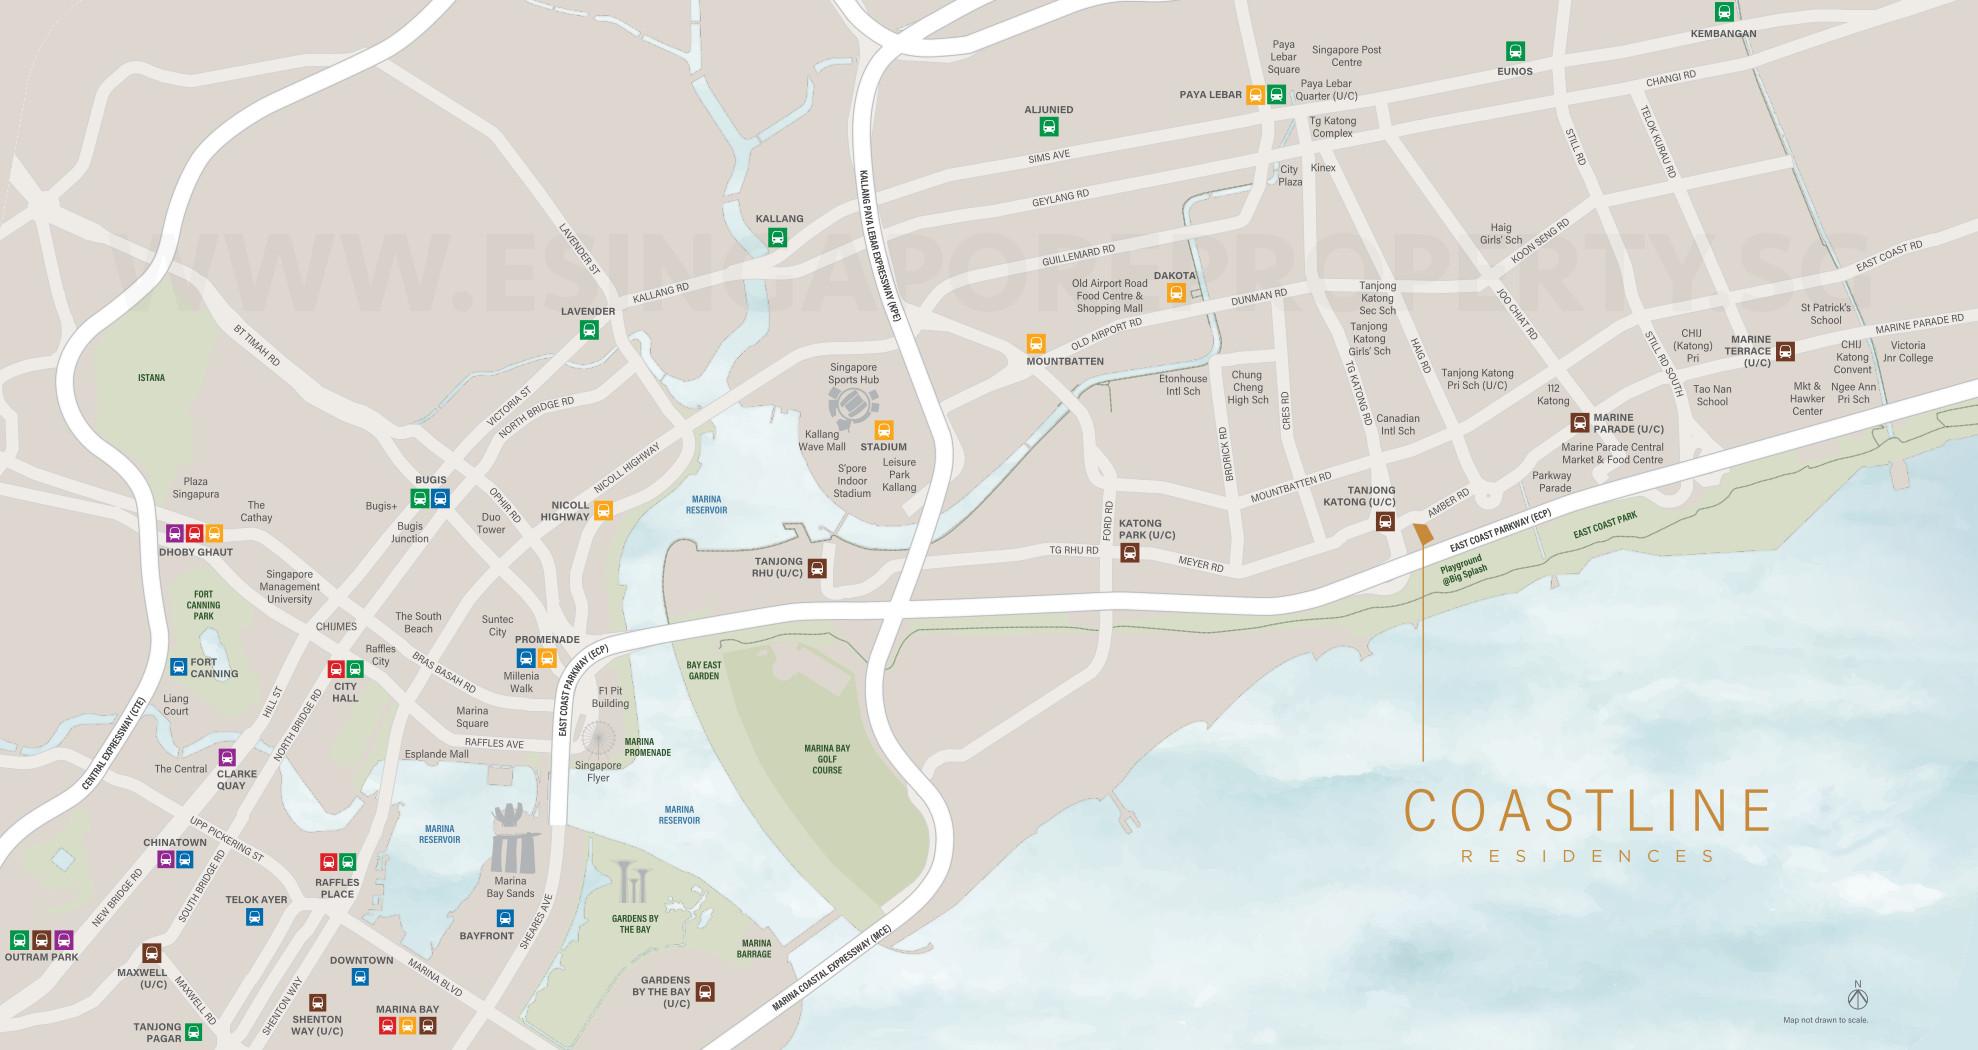 Coastline Residences Location Map and Amenities